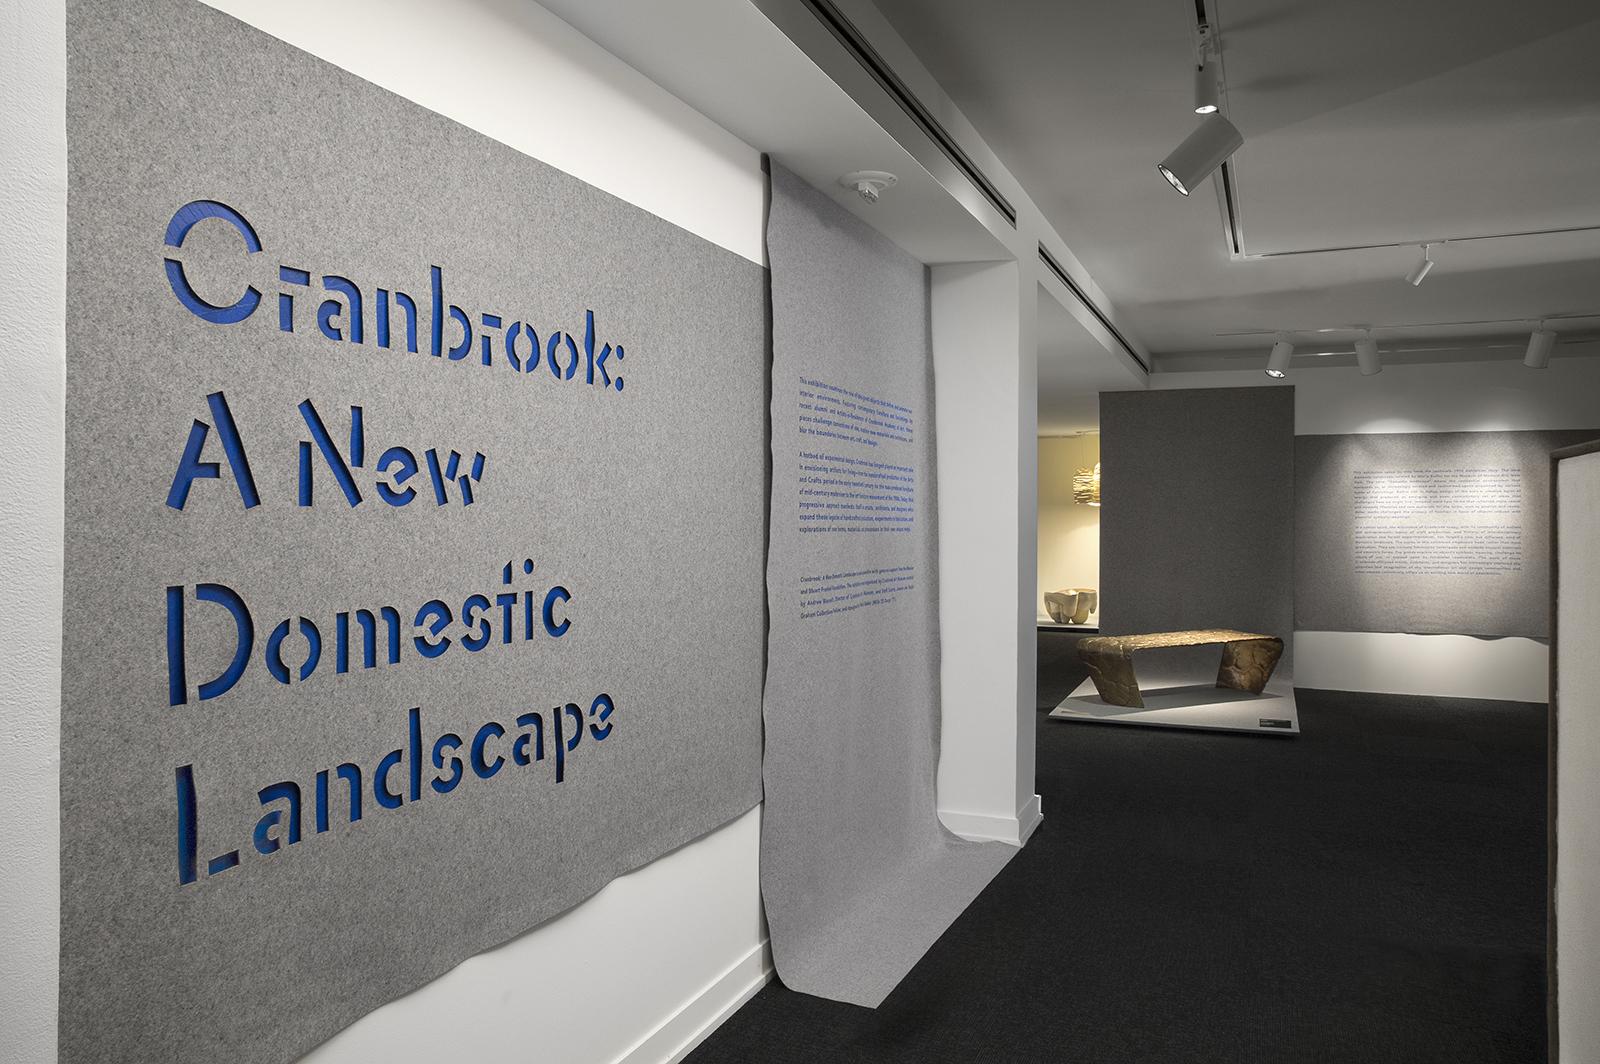 CRANBROOK: A NEW DOMESTIC LANDSCAPE    Cranbrook Art Museum   May 2017 - January 2018   Photo: PD Rearick